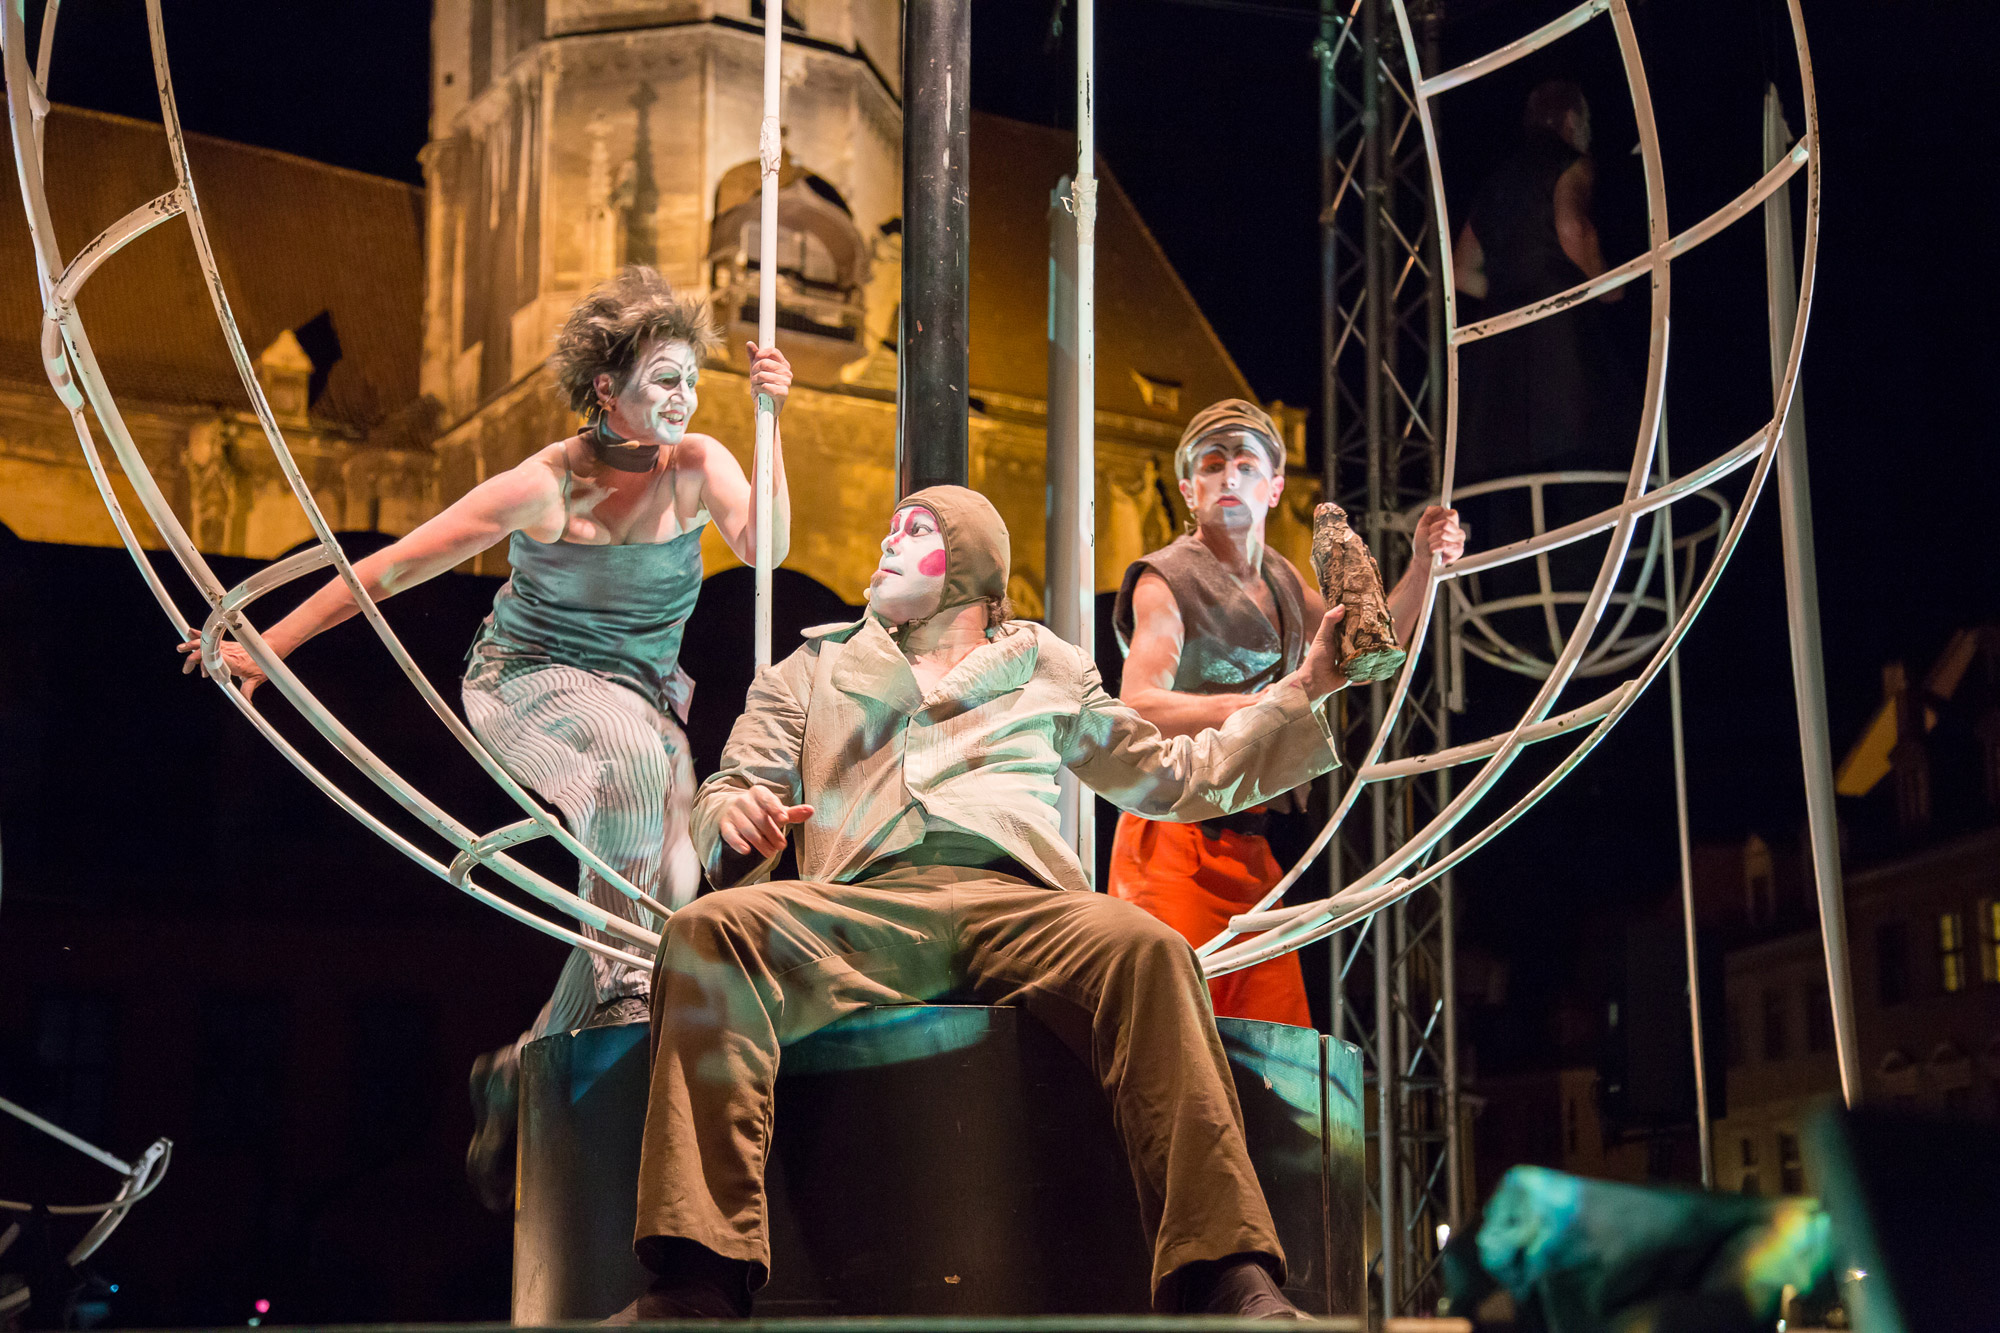 Shakespeare, Tempest, Sturm, Naumburg, PAN.OPTIKUM, Straßentheater, Sabine Noll, Willi Schindler, Wolfgang Dvorak,